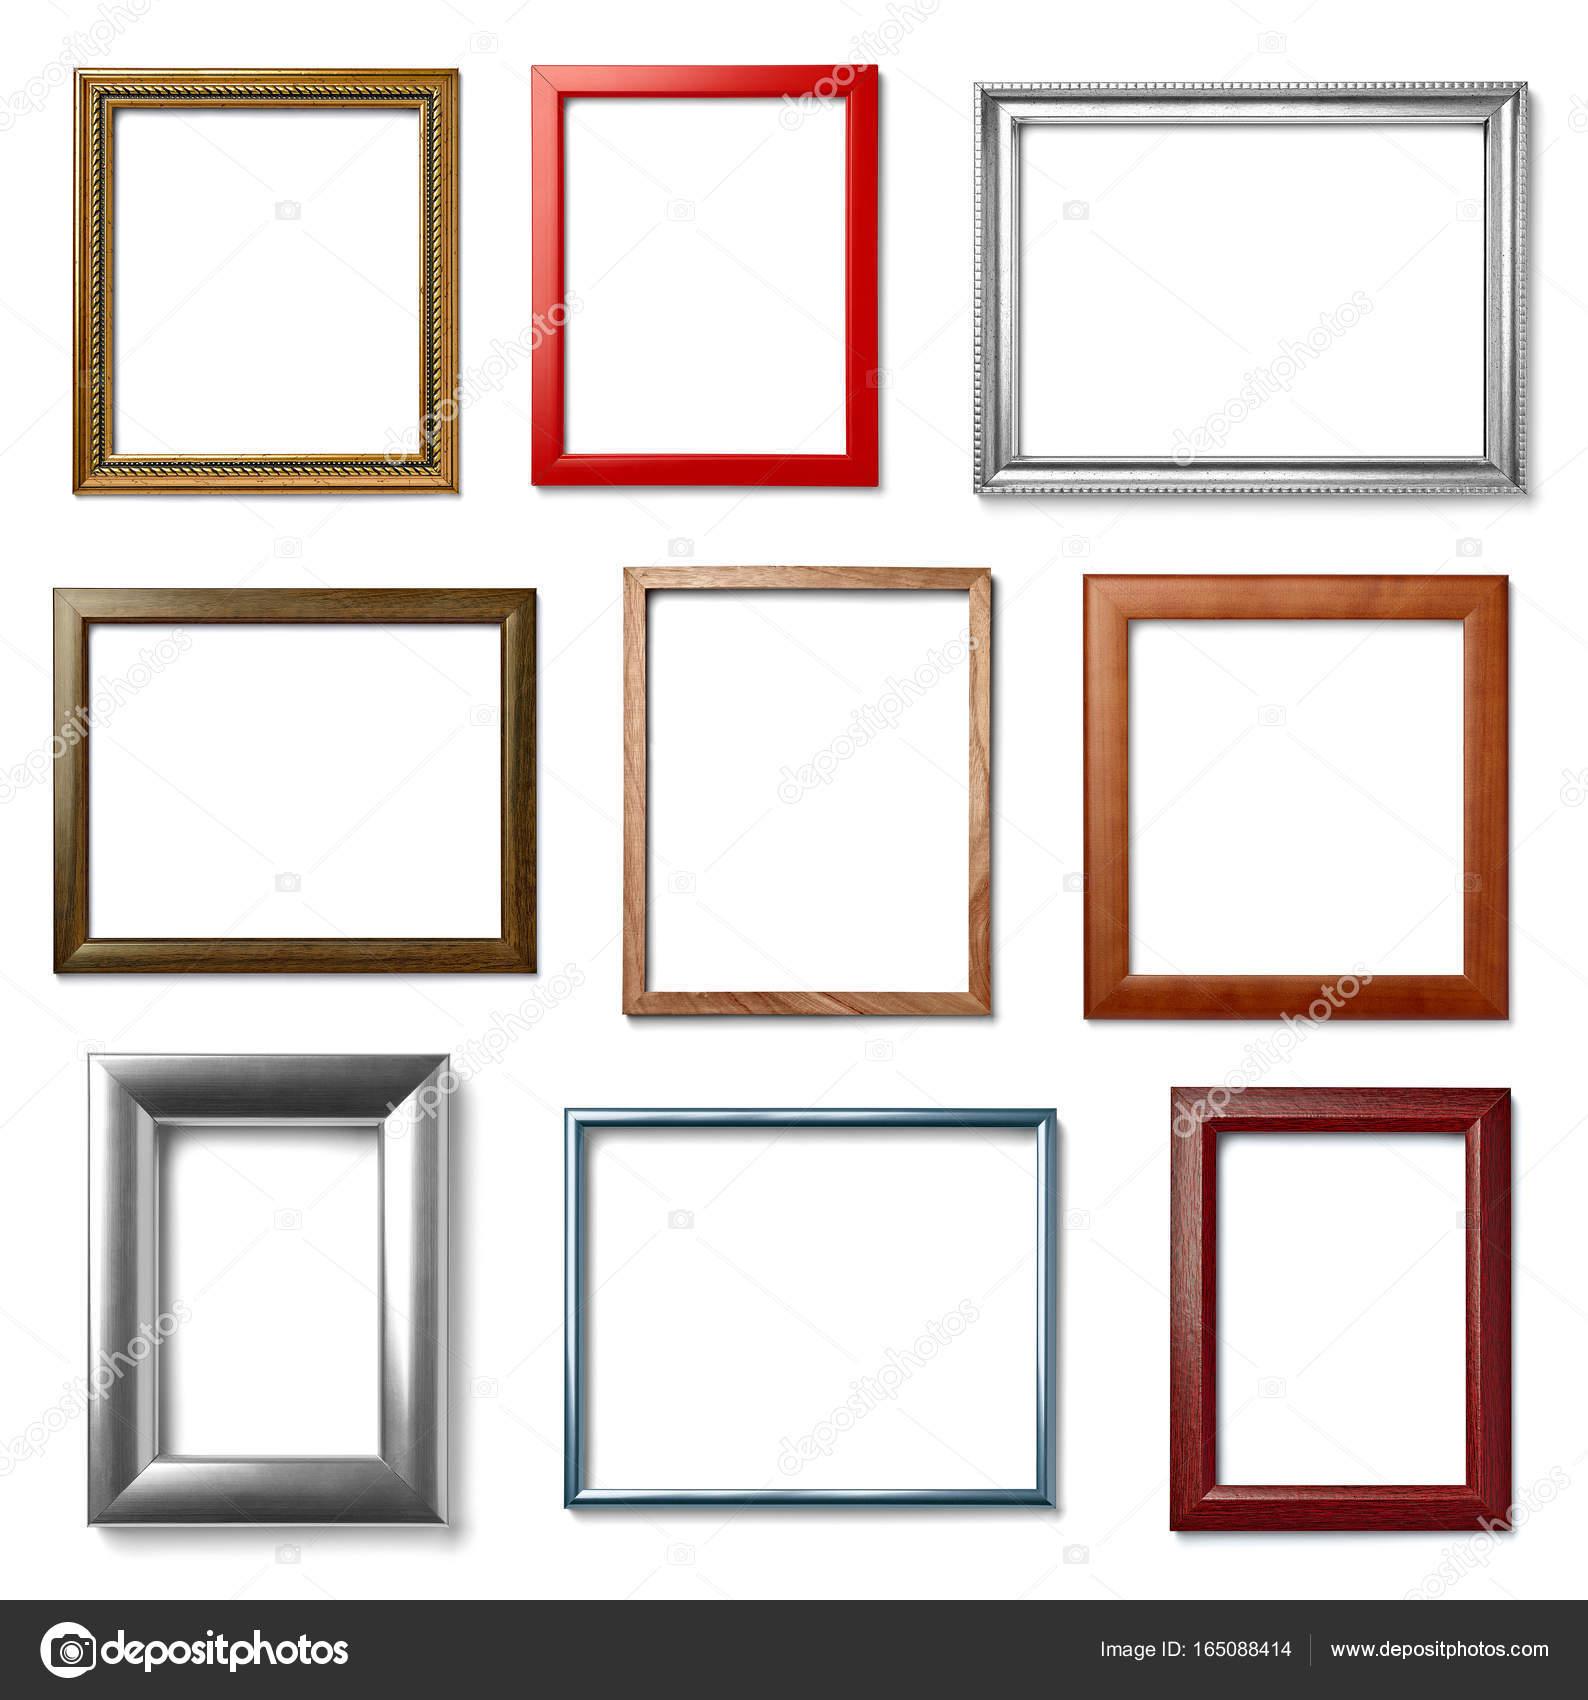 Vintage-Rahmen Holz Hintergrundbild — Stockfoto © PicsFive #165088414